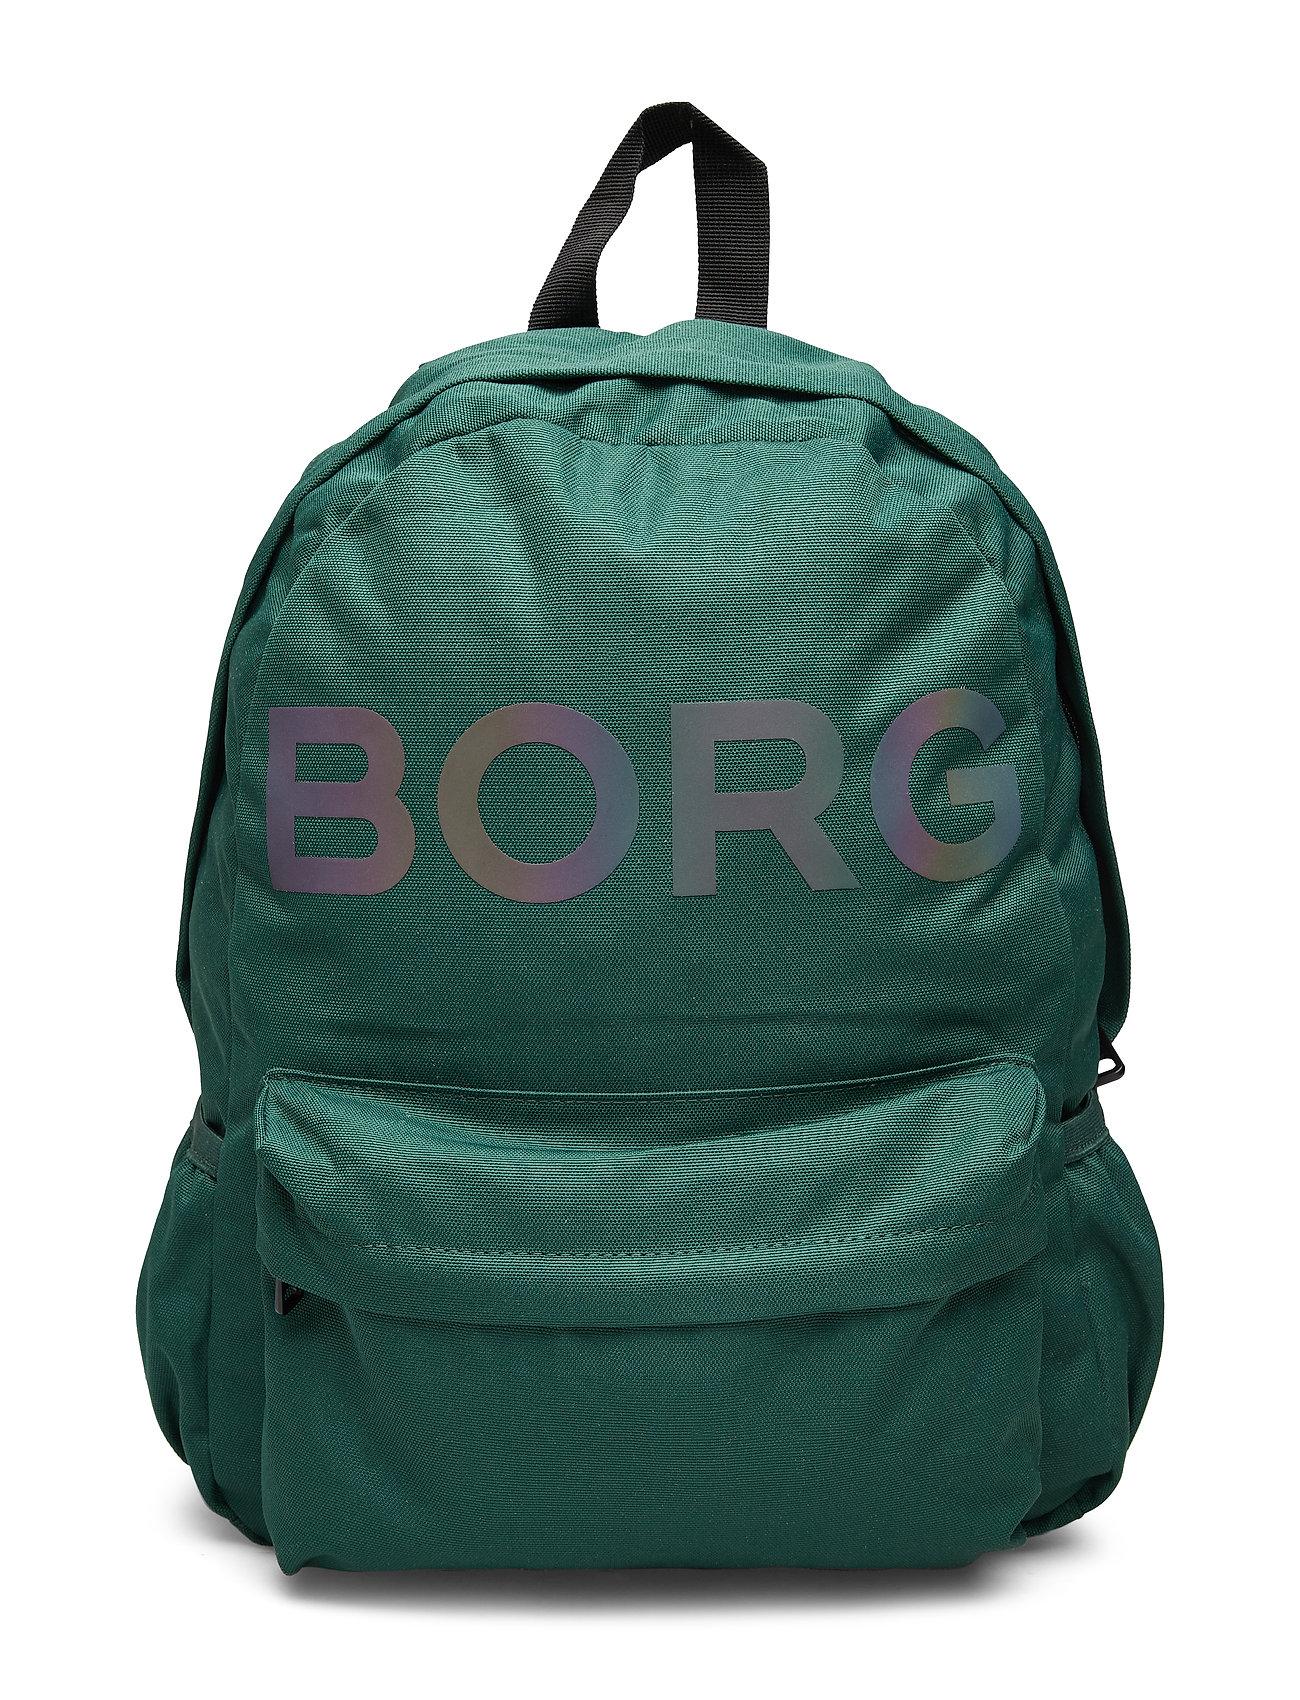 Björn Borg Bags VANESSA - GREEN